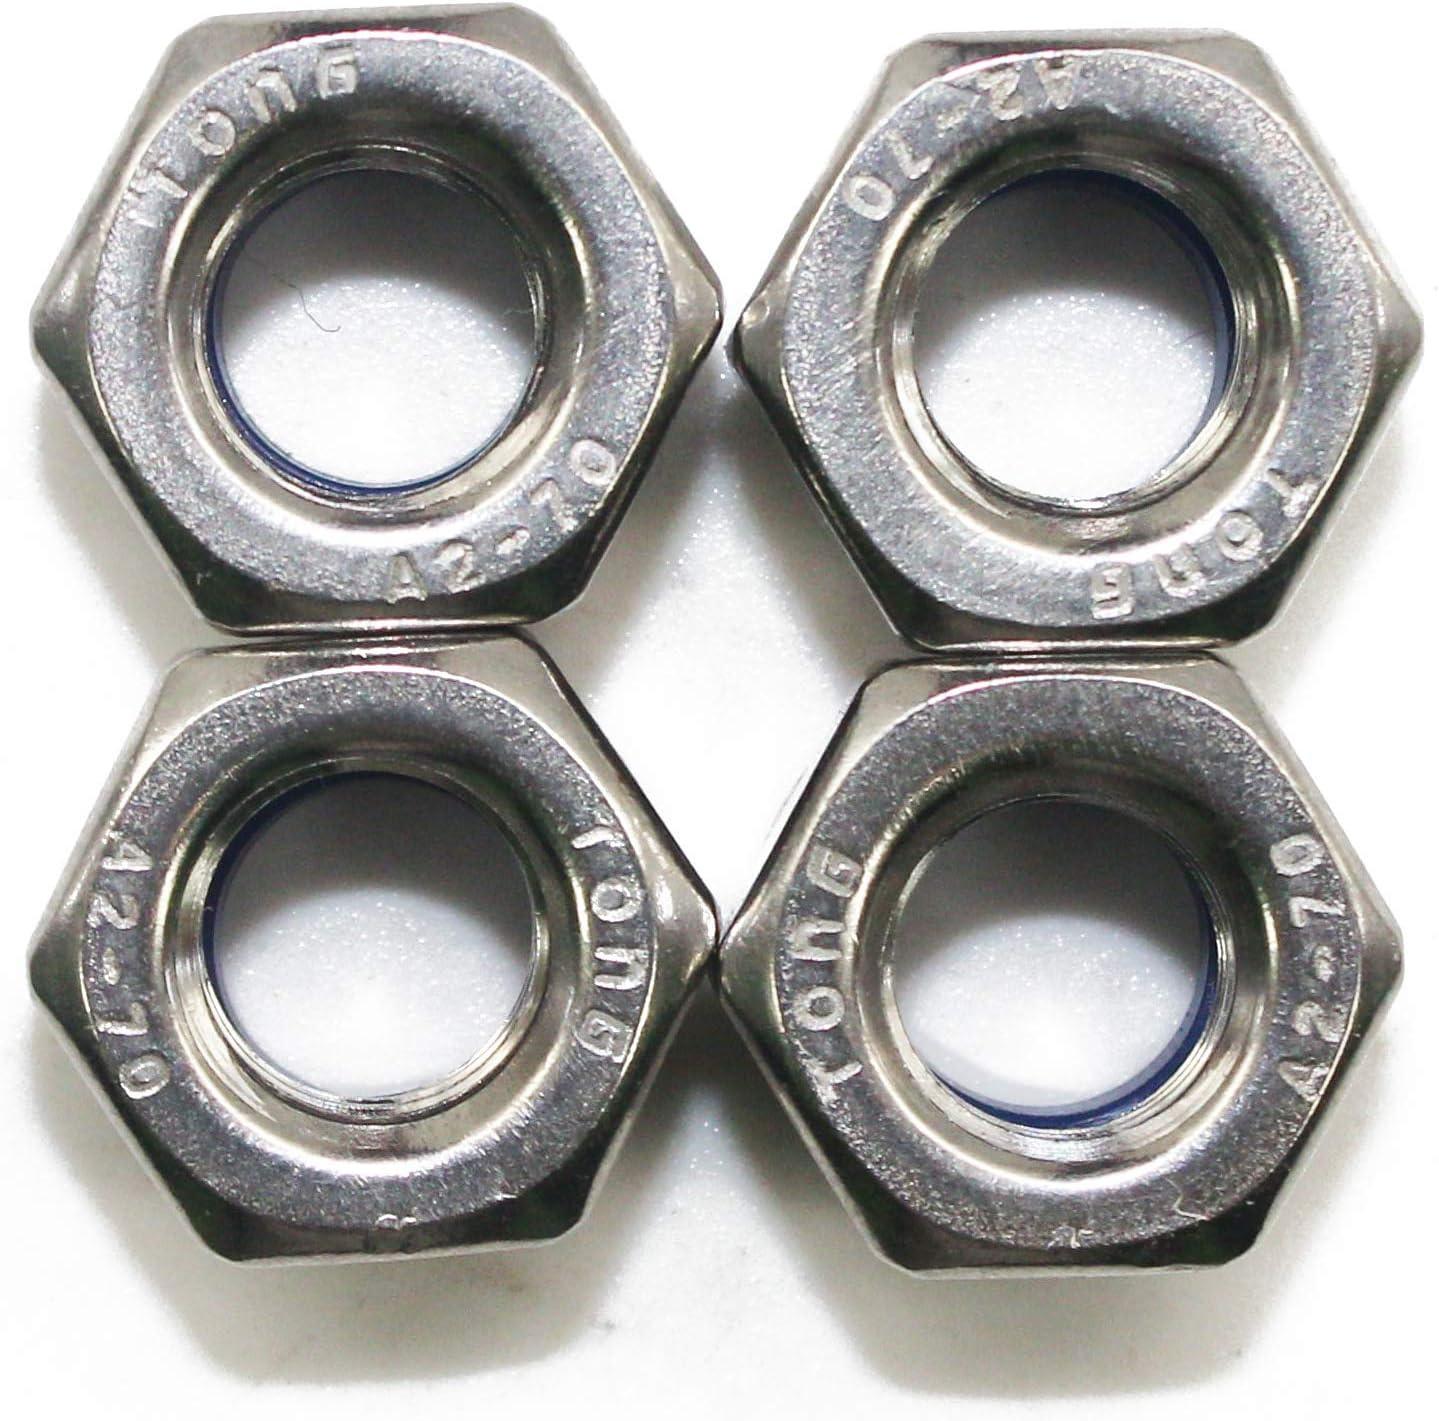 Fullerkreg M5 x 0.8mm DIN985 Self-Locking Nylon Insert Hex Lock Nuts,Stainless Steel A2-70//304//18-8,Plain Finish,Quantity 100PCS